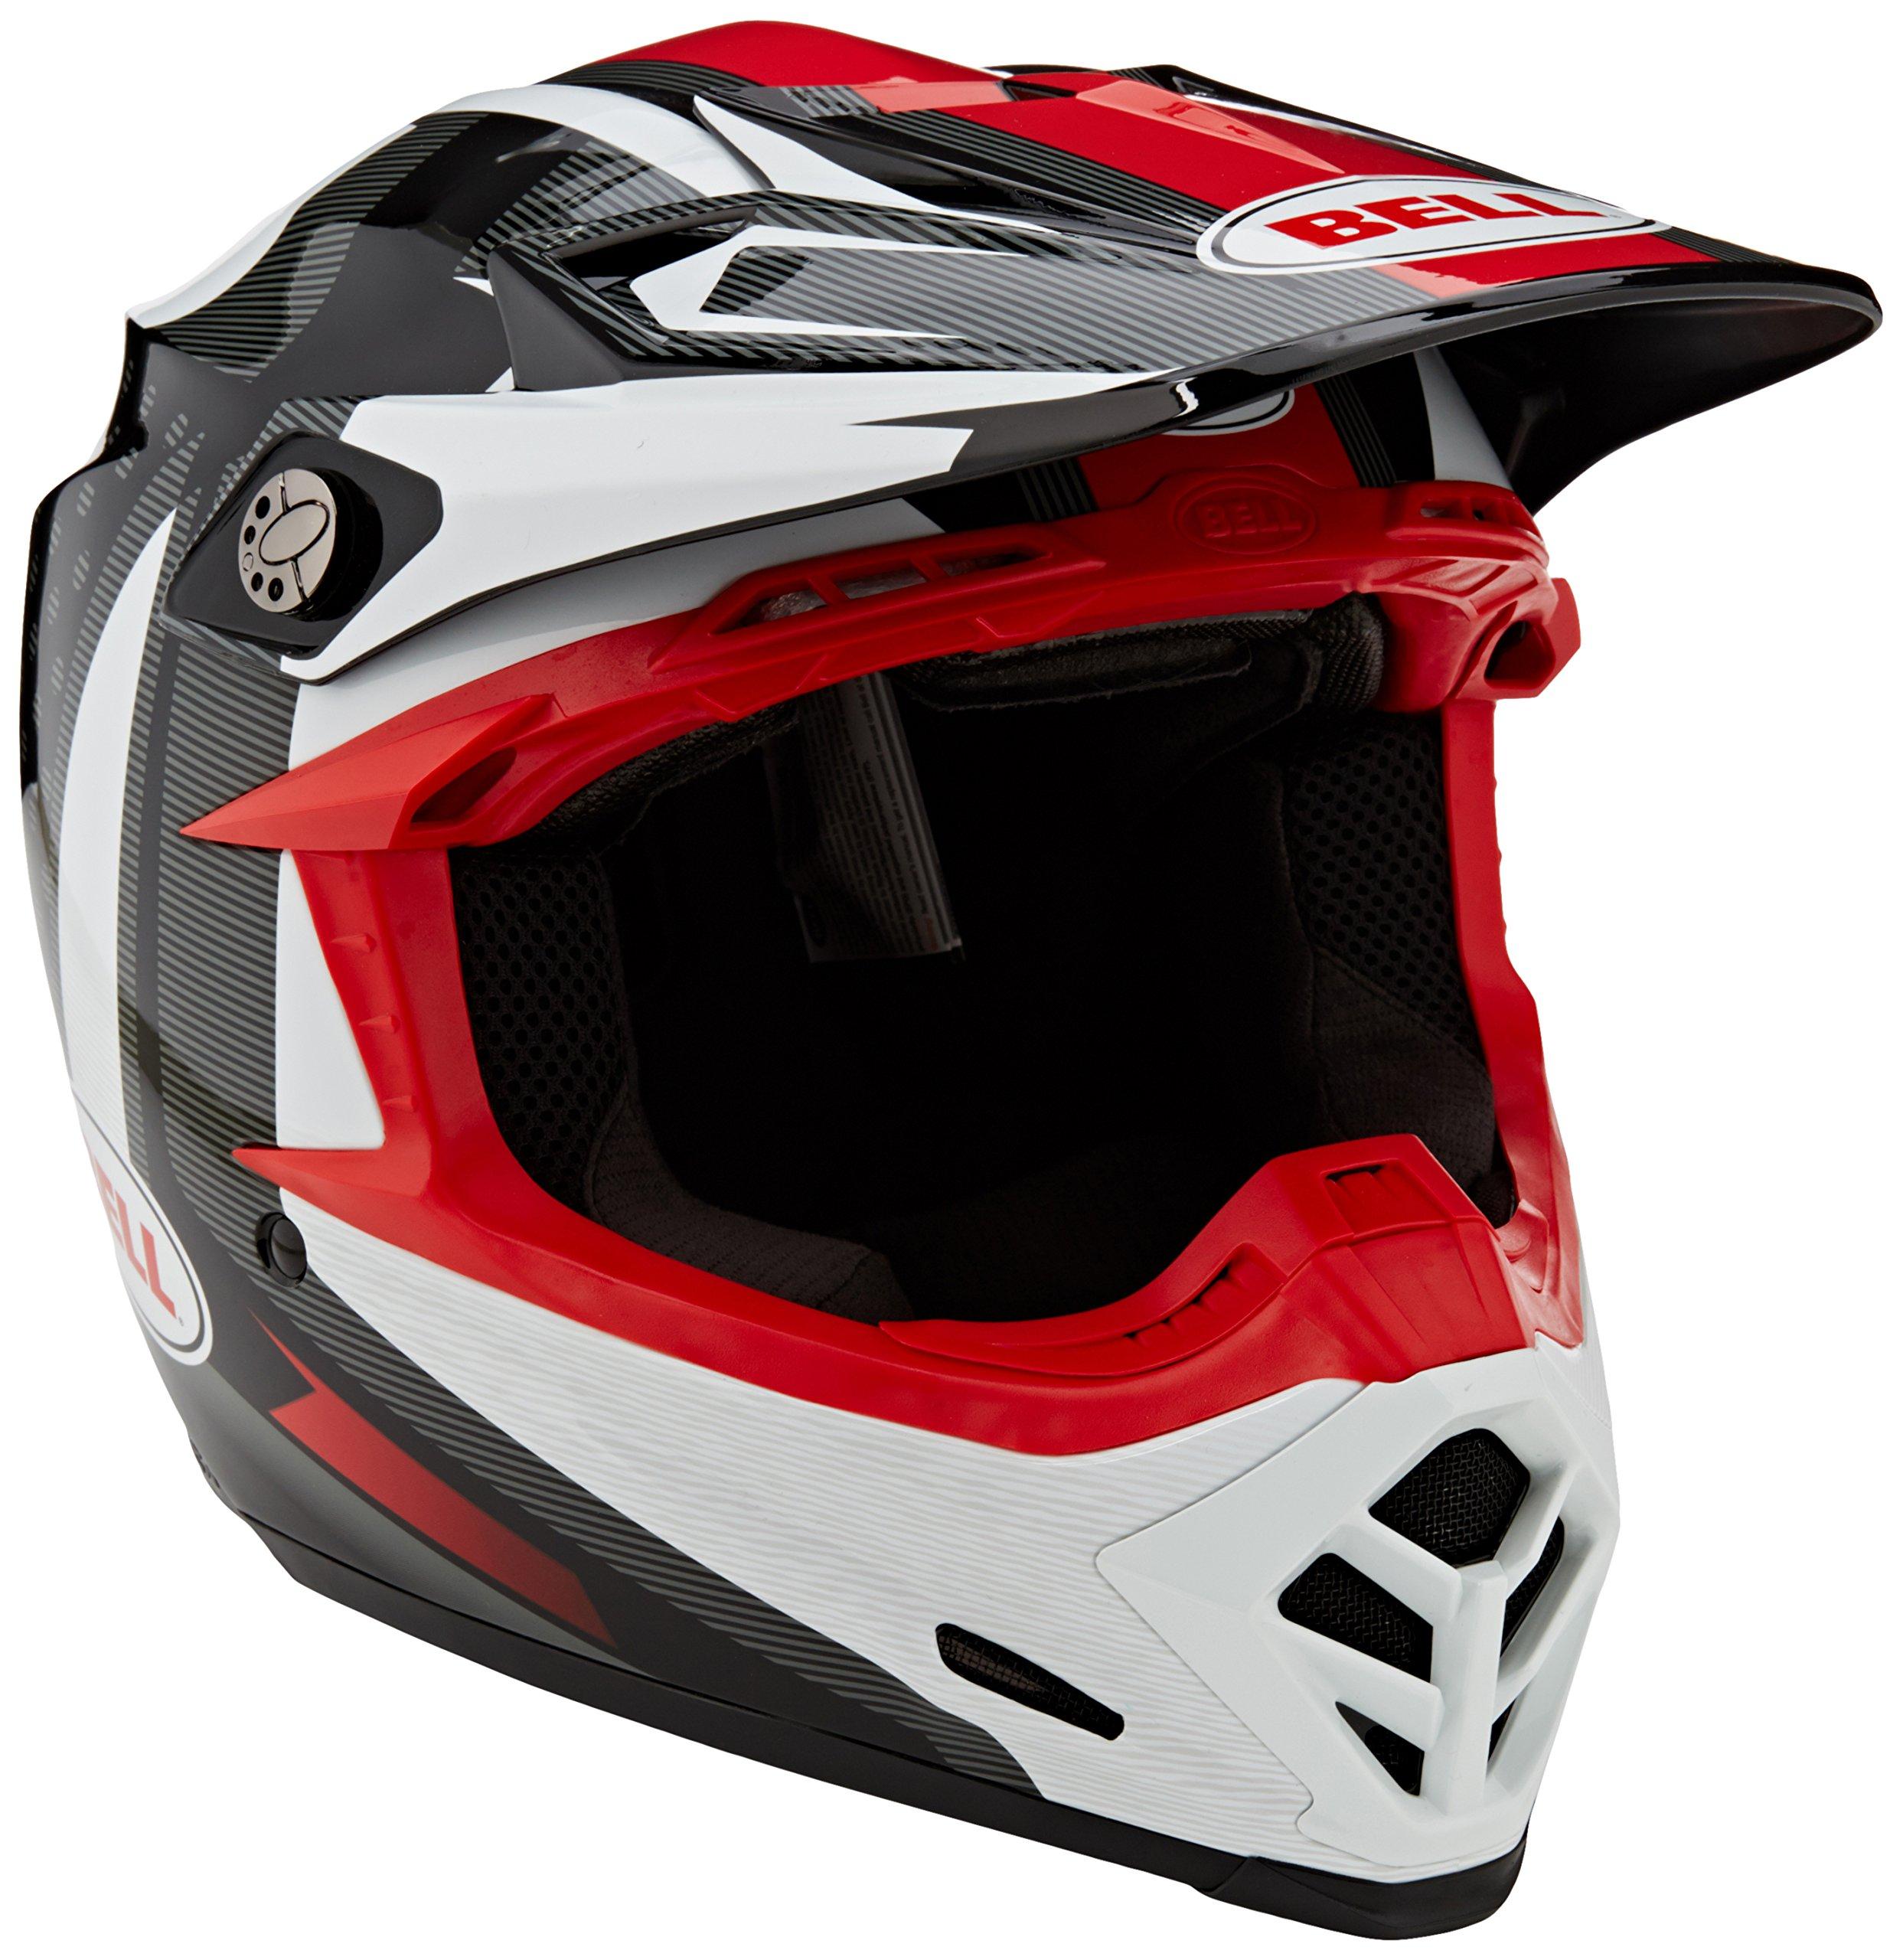 Bell caschi MX 2017moto-9Flex morsa da adulto casco, nero/bianco, taglia M